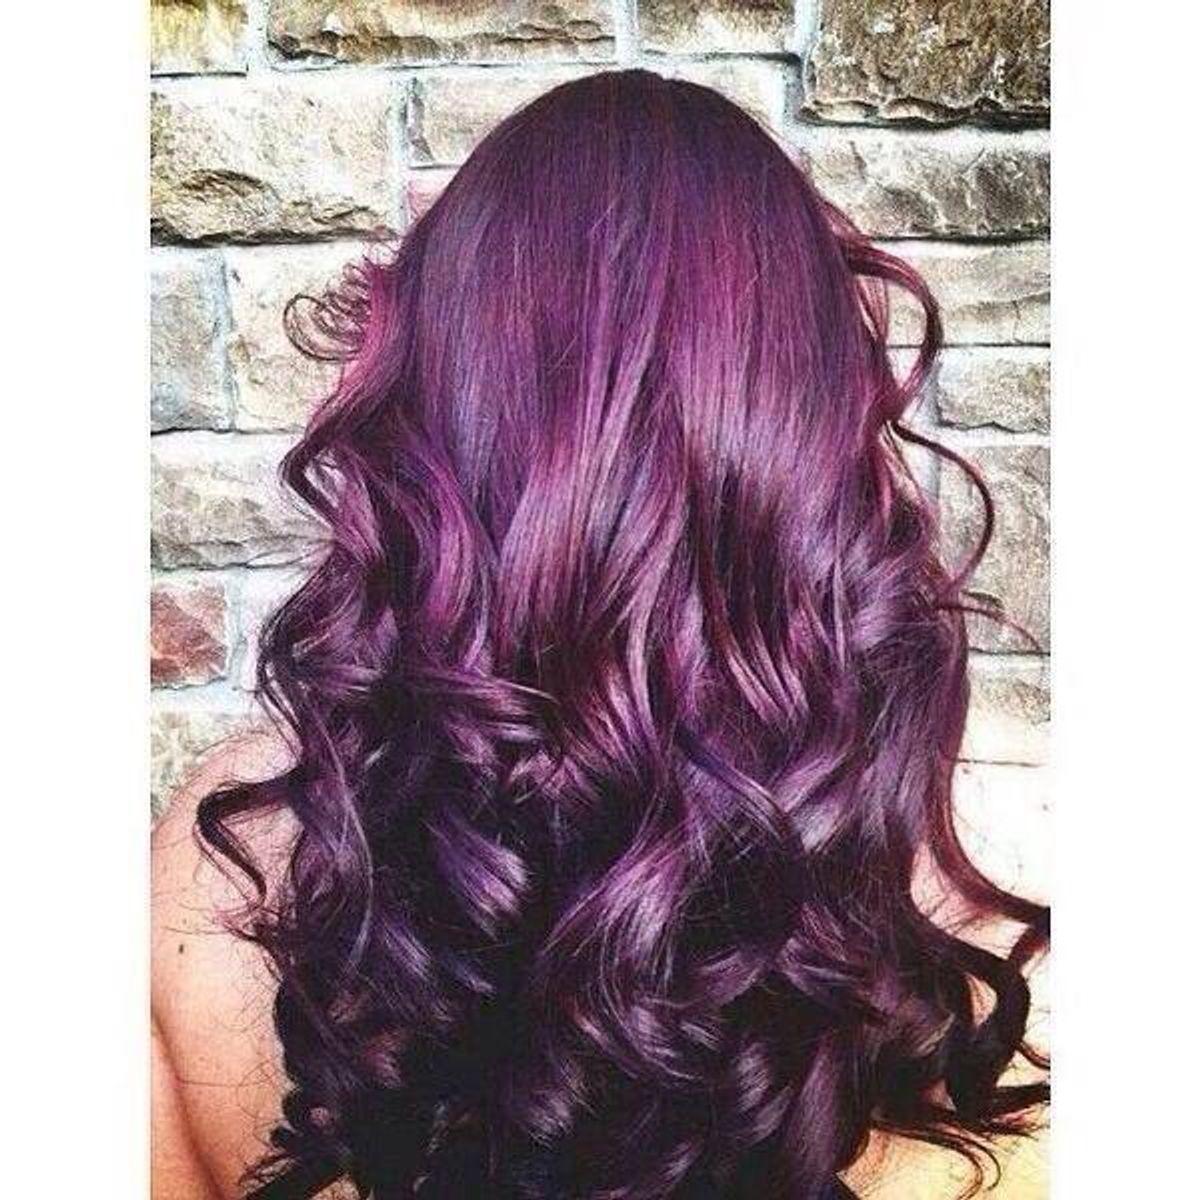 How Dying My Hair Purple Saved My Life